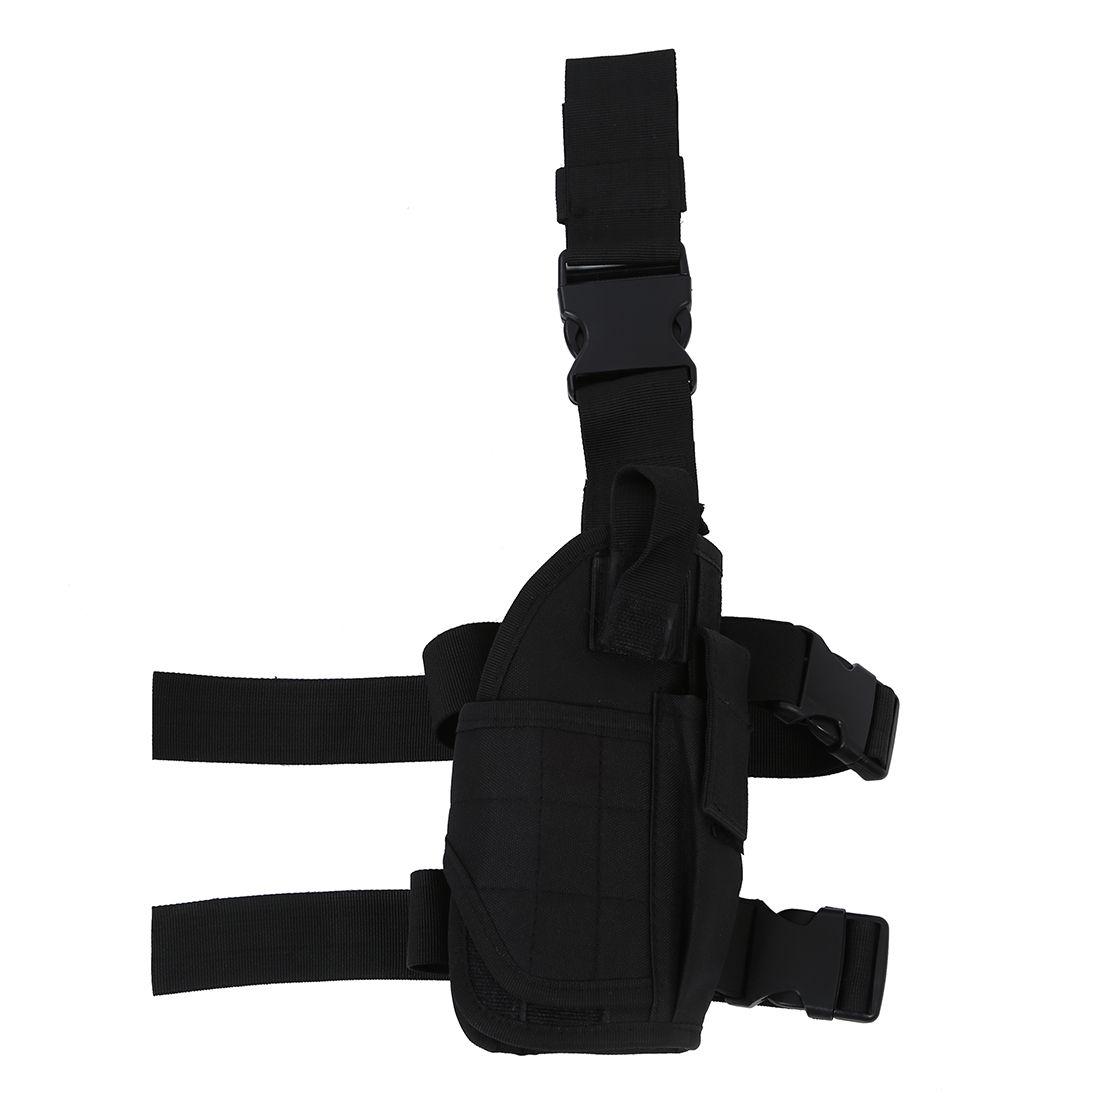 New Sale Tactical Army Pistol/Gun Drop Leg Thigh Holster - Black